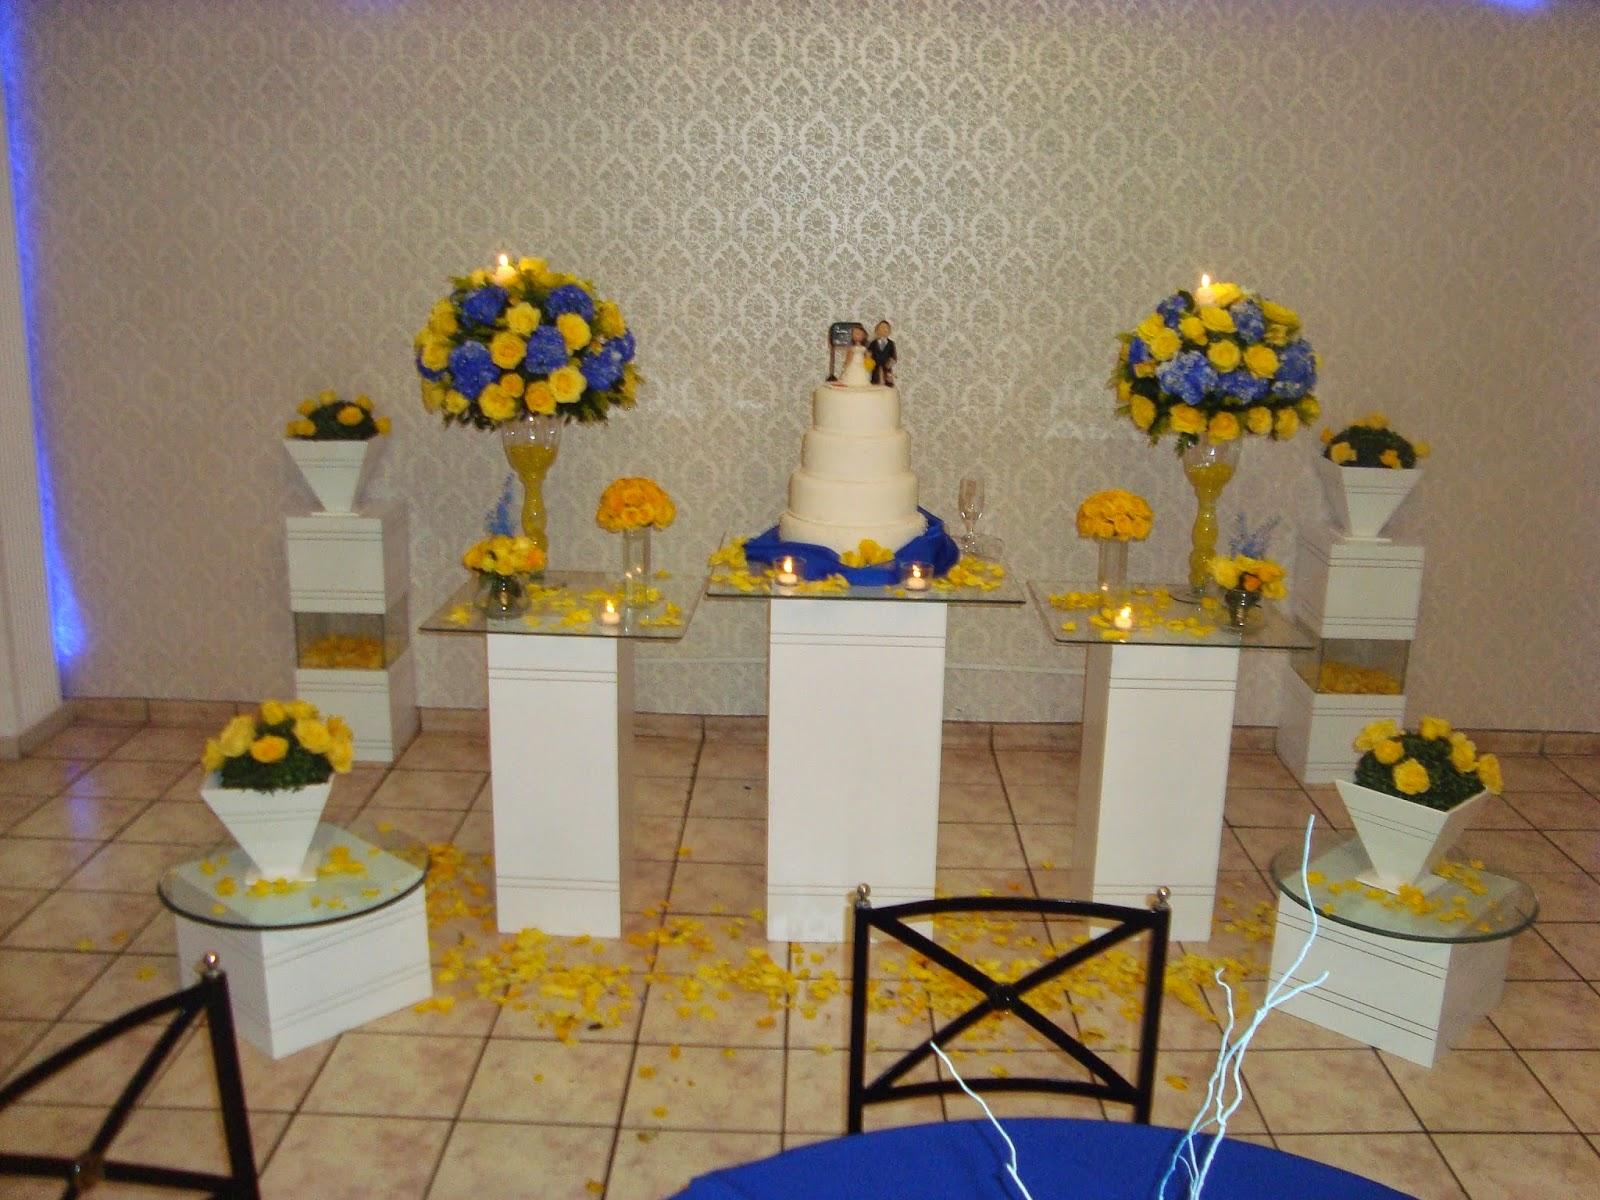 fotos de decoracao de casamento azul e amarelo:Foto Decoracao Amarela Casamento 15